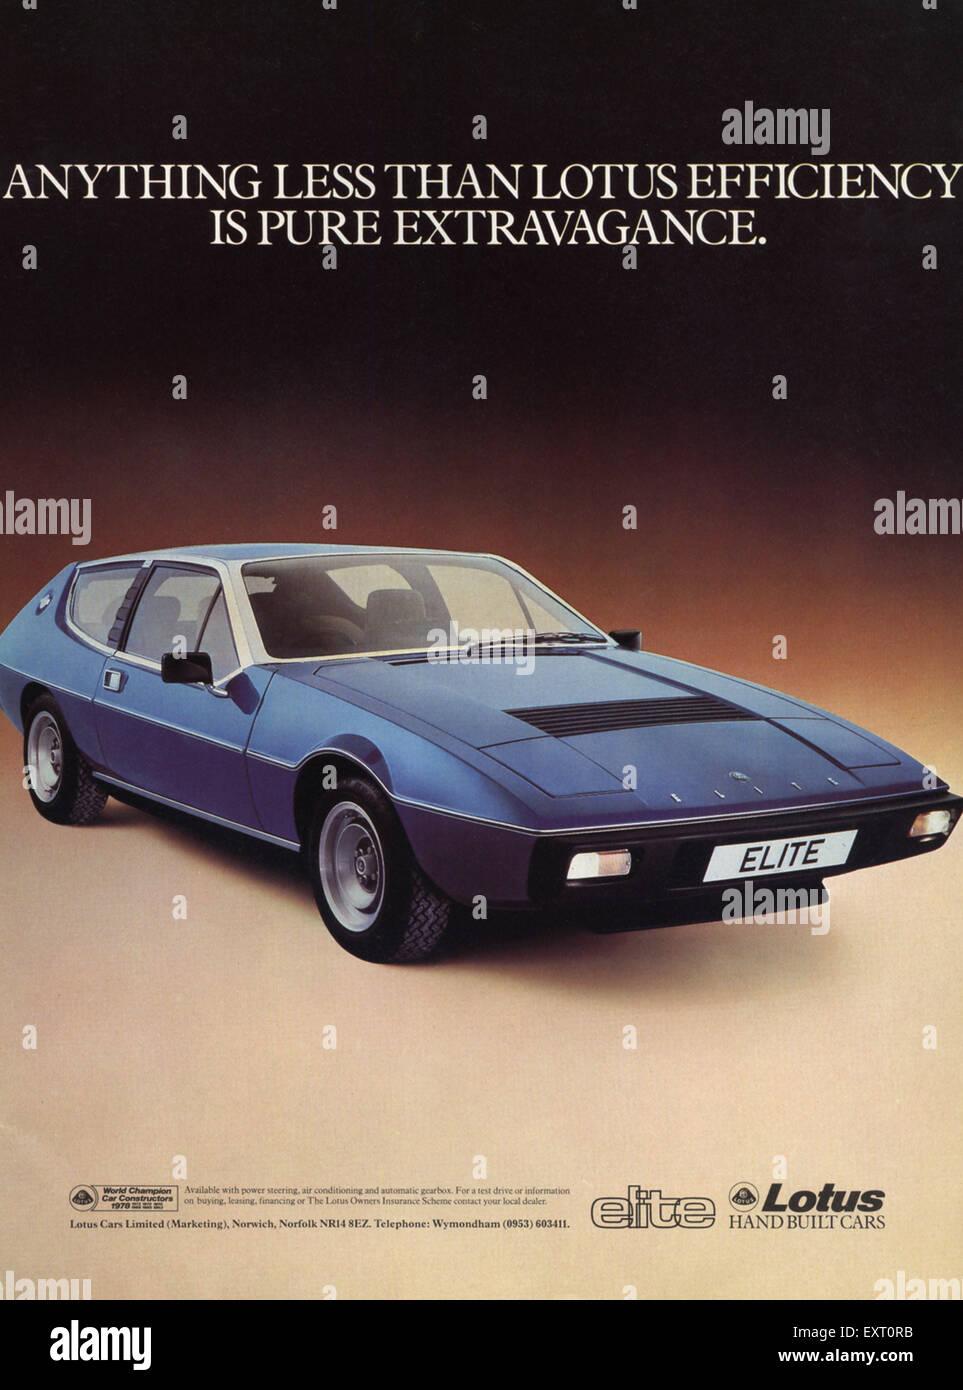 1970s uk lotus elite magazine advert stock image